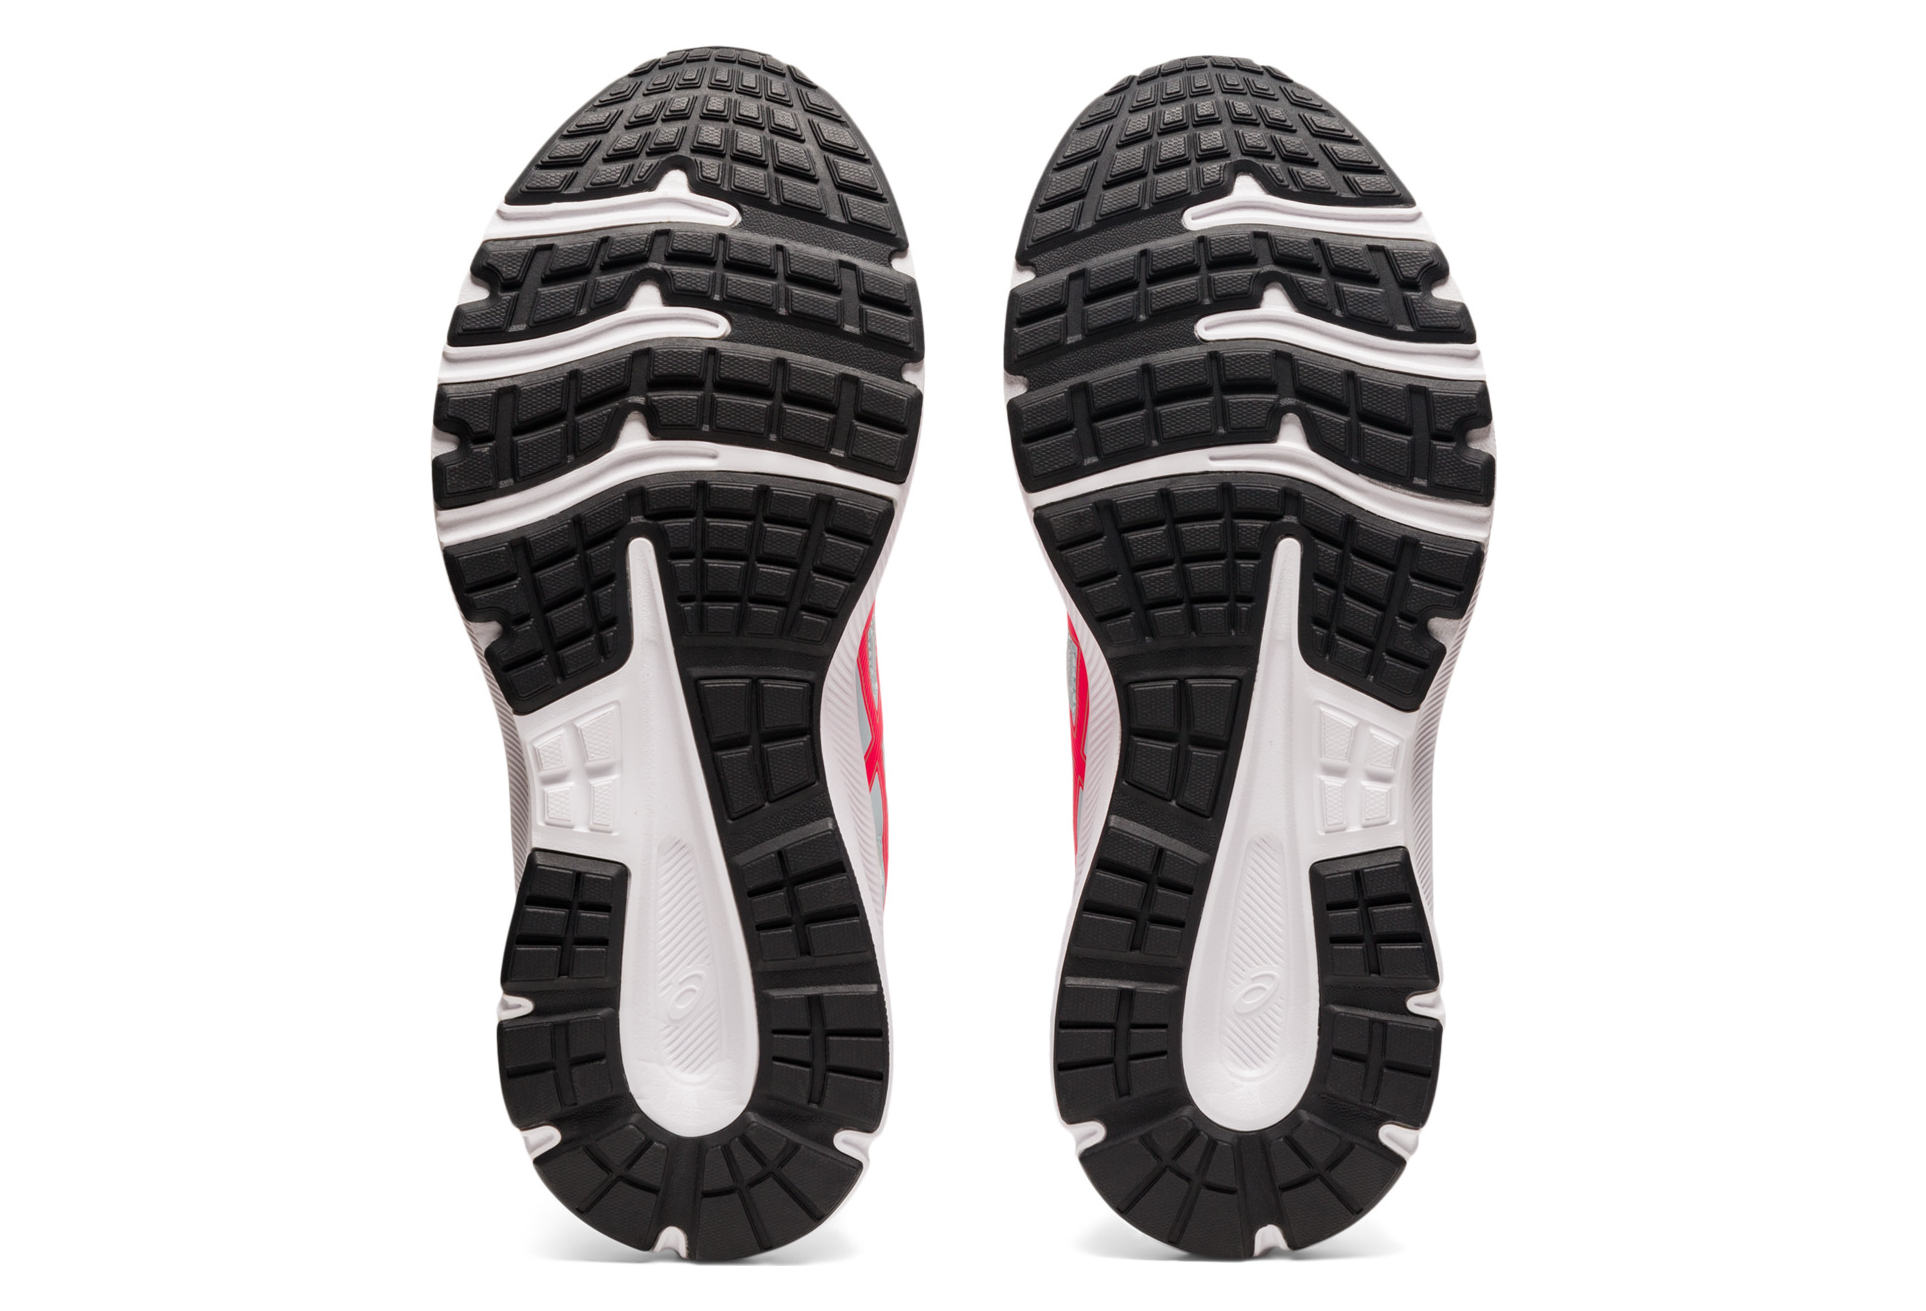 Chaussures enfant Asics Jolt 3 Gs   Alltricks.com